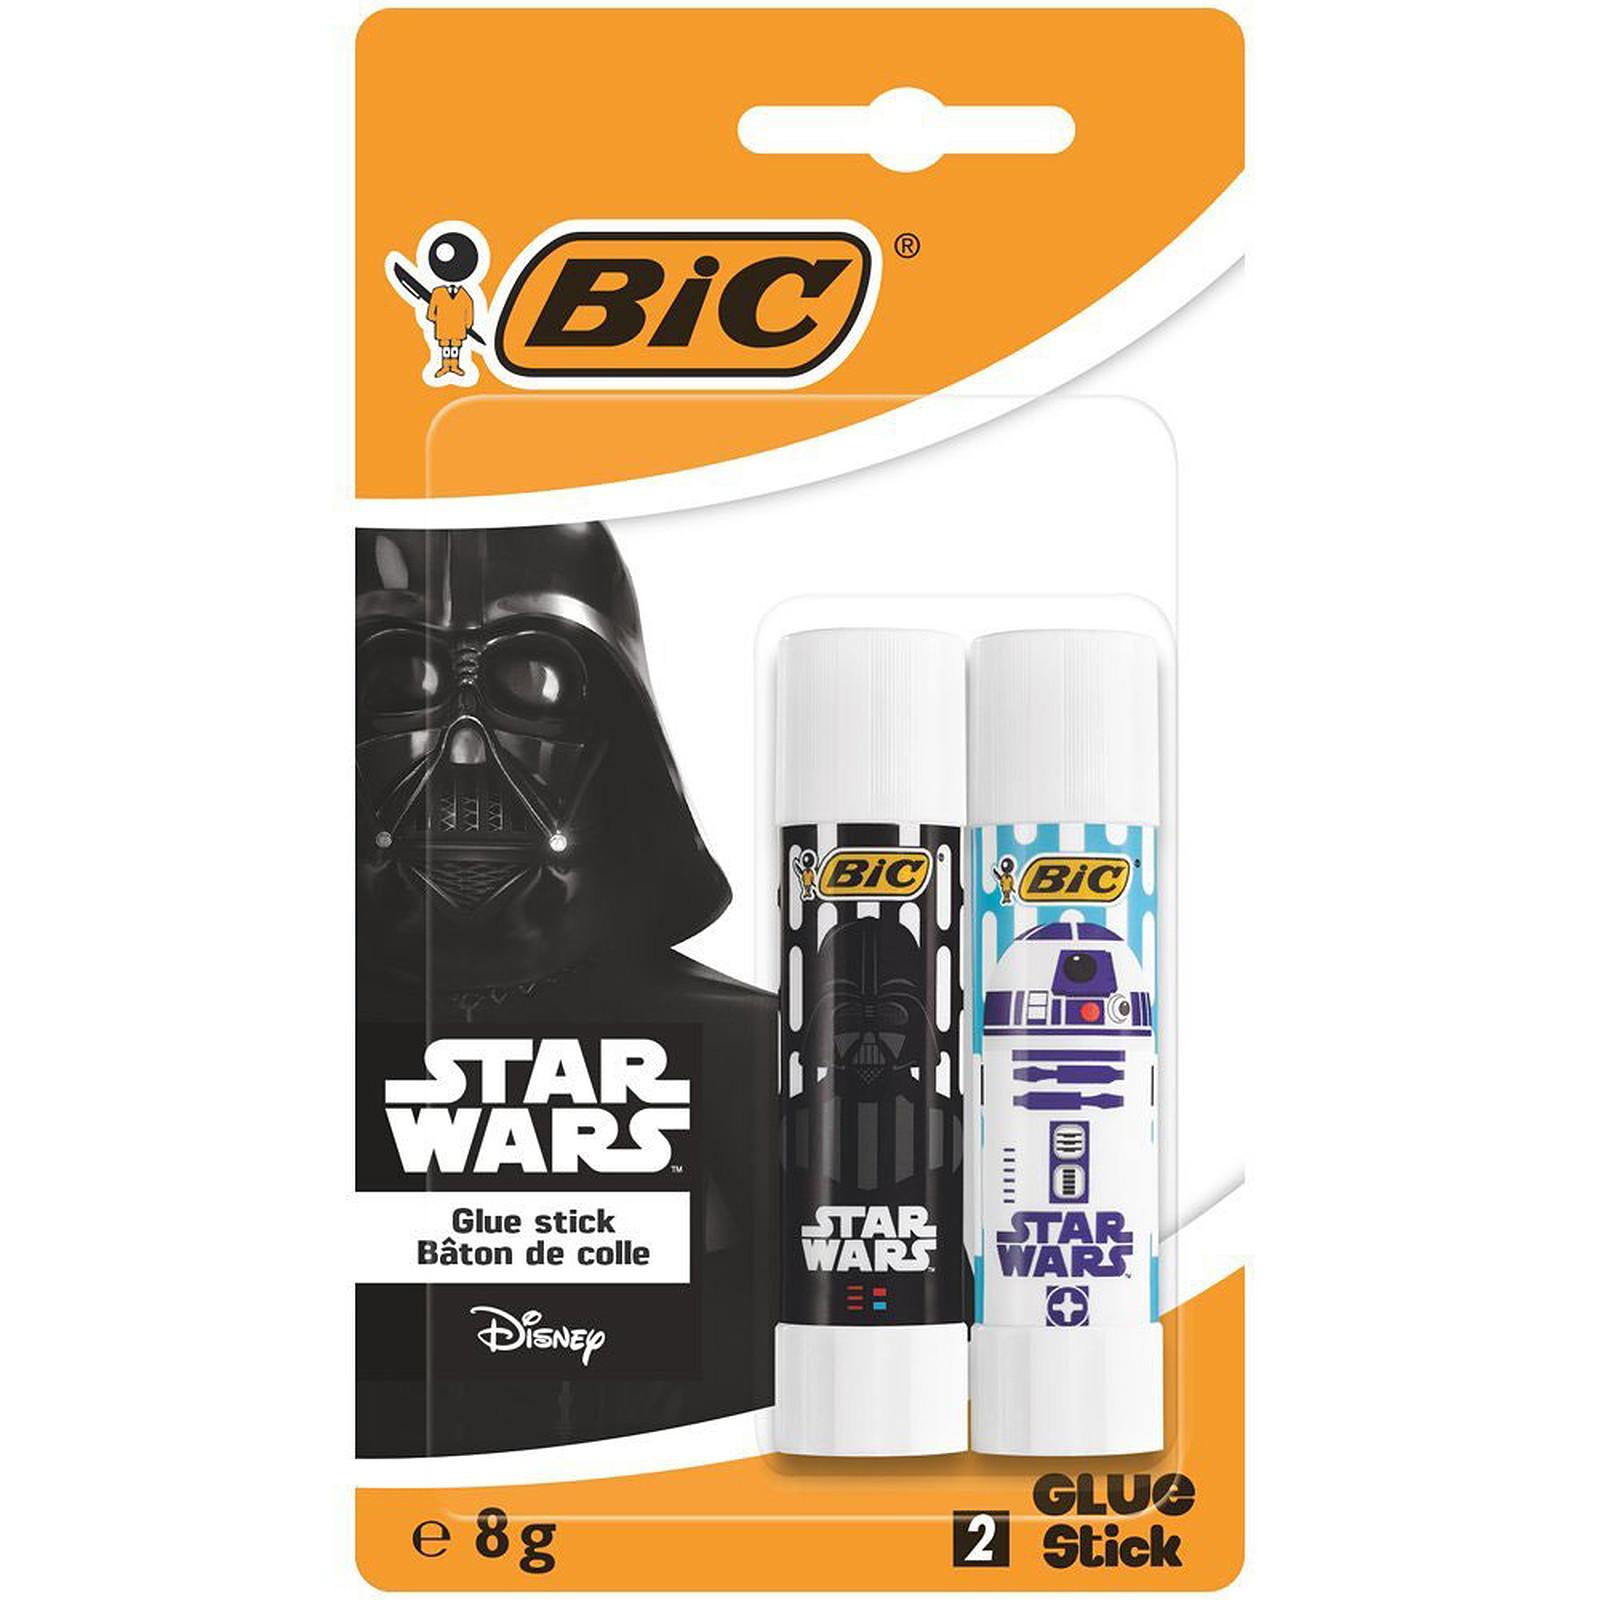 Bic Glue Stick Star Wars